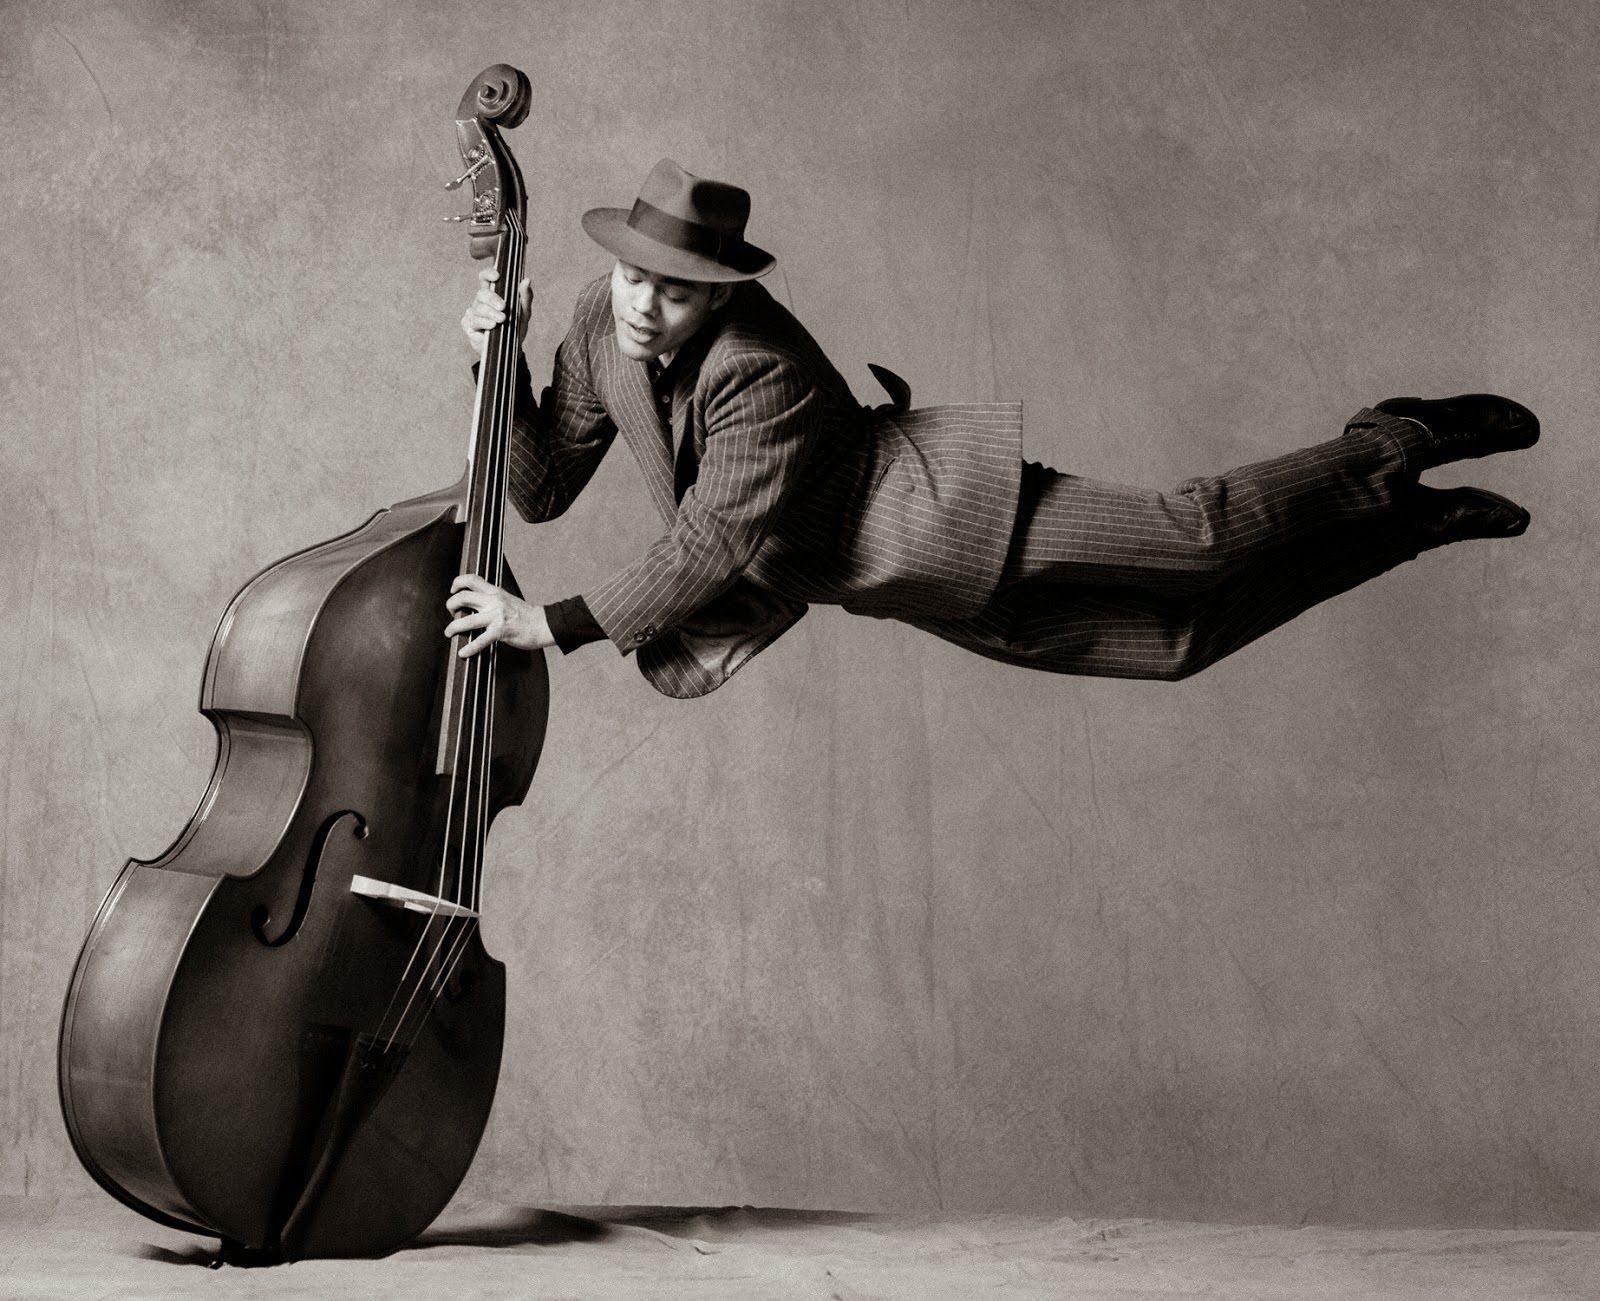 Картинки танцующих музыкантов